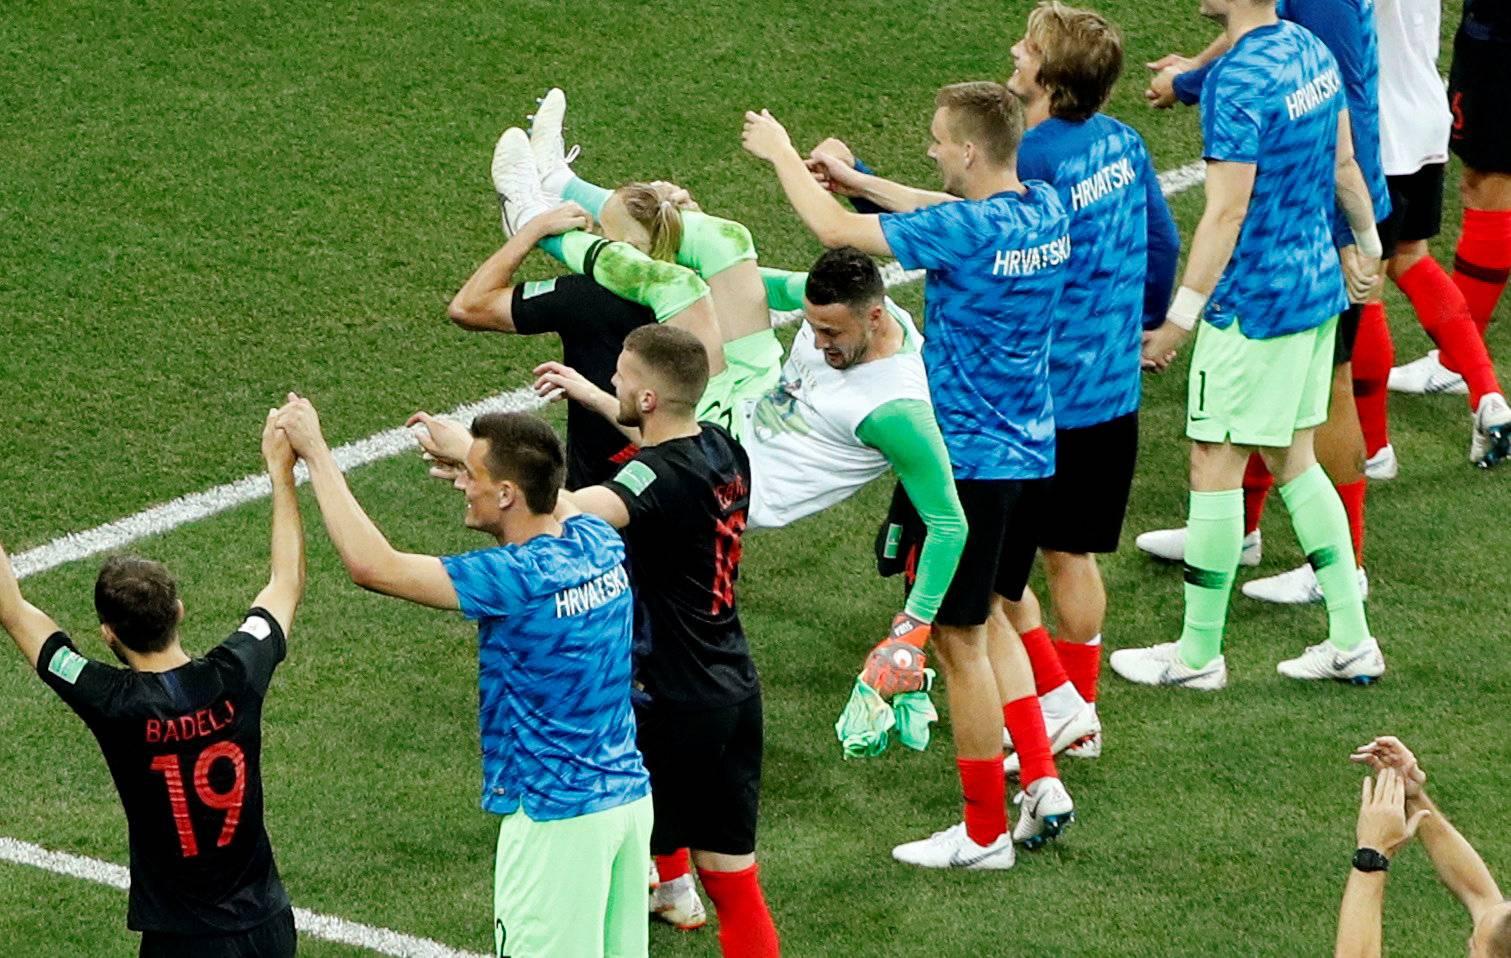 World Cup - Round of 16 - Croatia vs Denmark